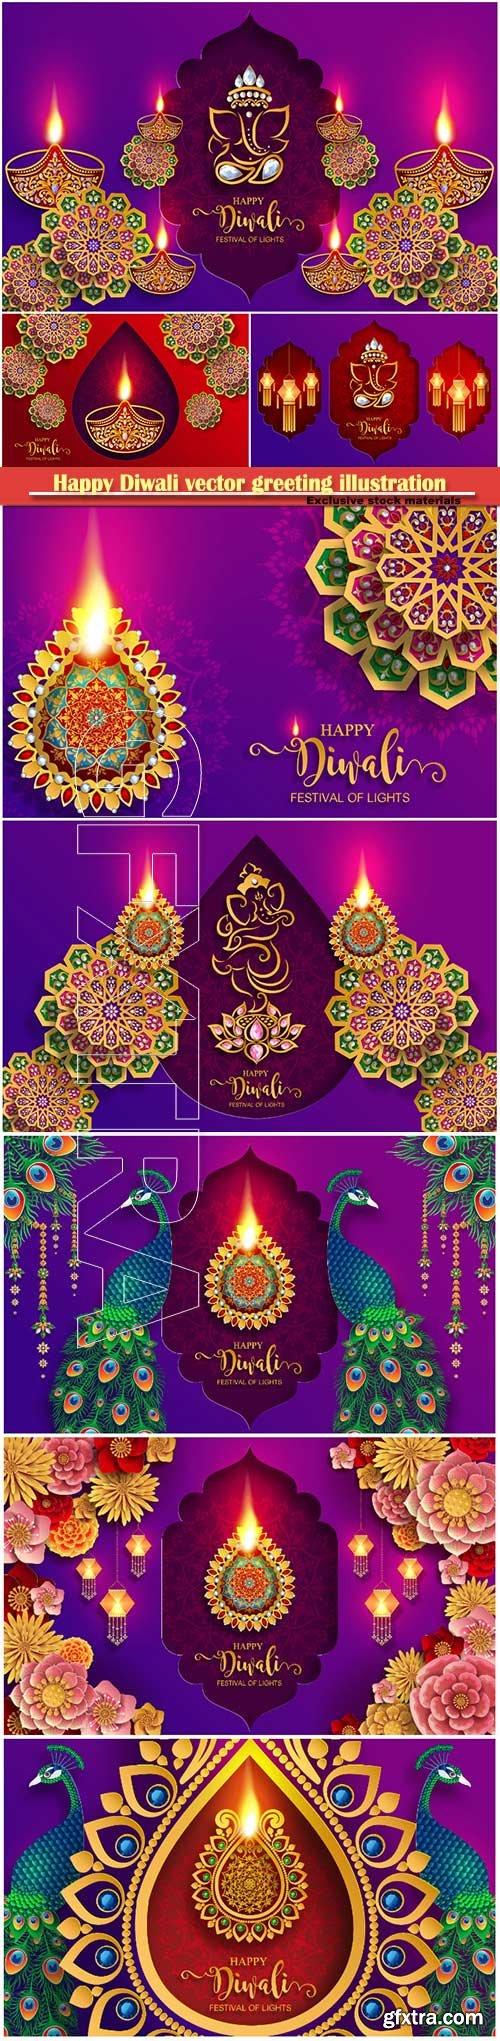 Happy Diwali vector greeting illustration template